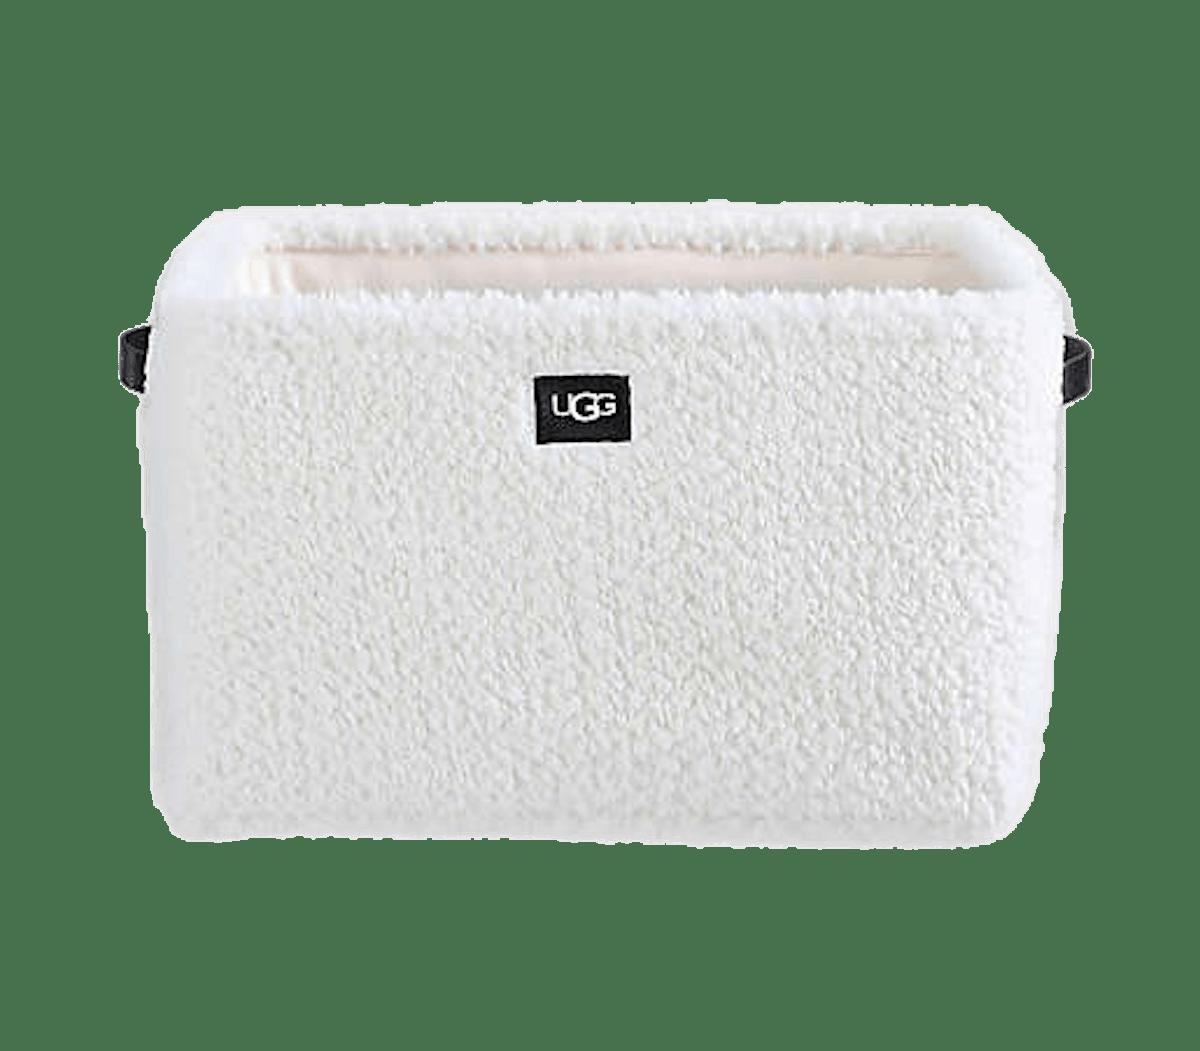 UGG Pitkin Faux Fur Storage Bin in Snow